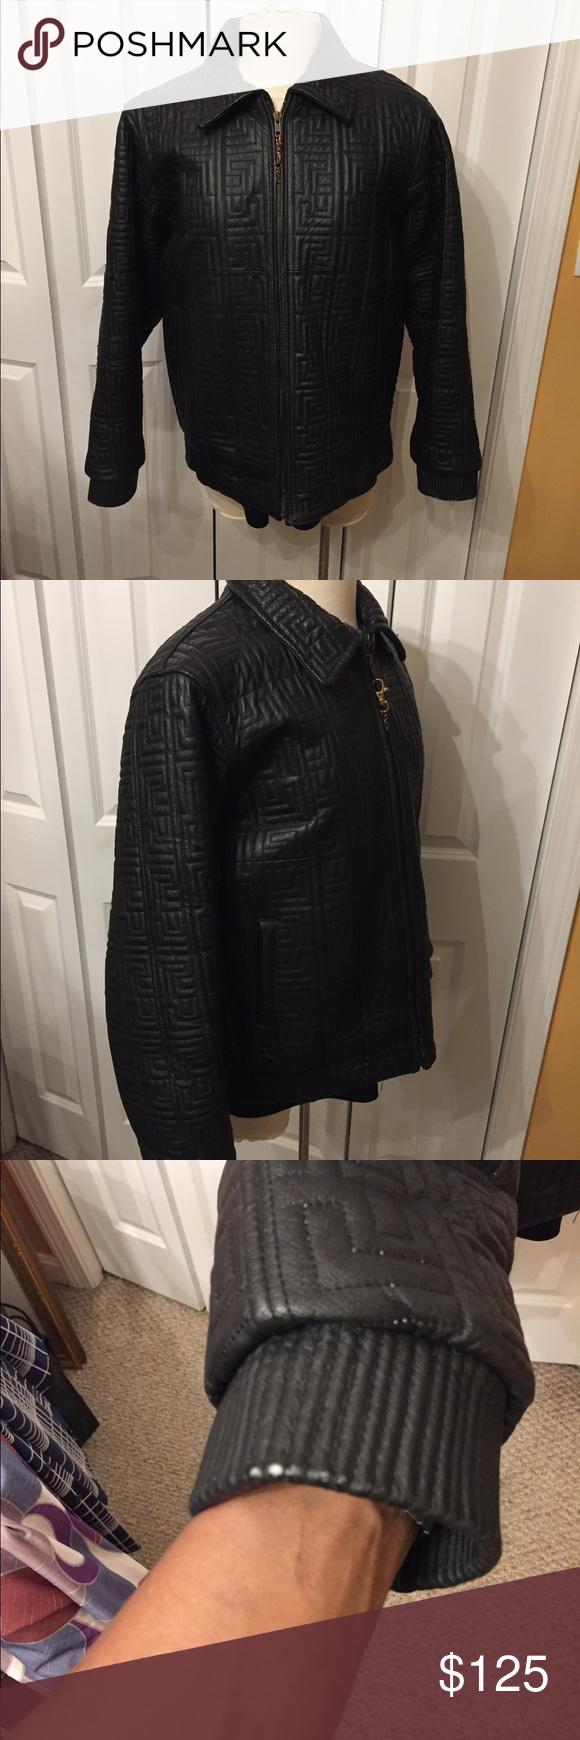 Vintage Vilanto Leather Jacket Size Medium Black Leather Jacket Jackets Vintage Jacket [ 1740 x 580 Pixel ]